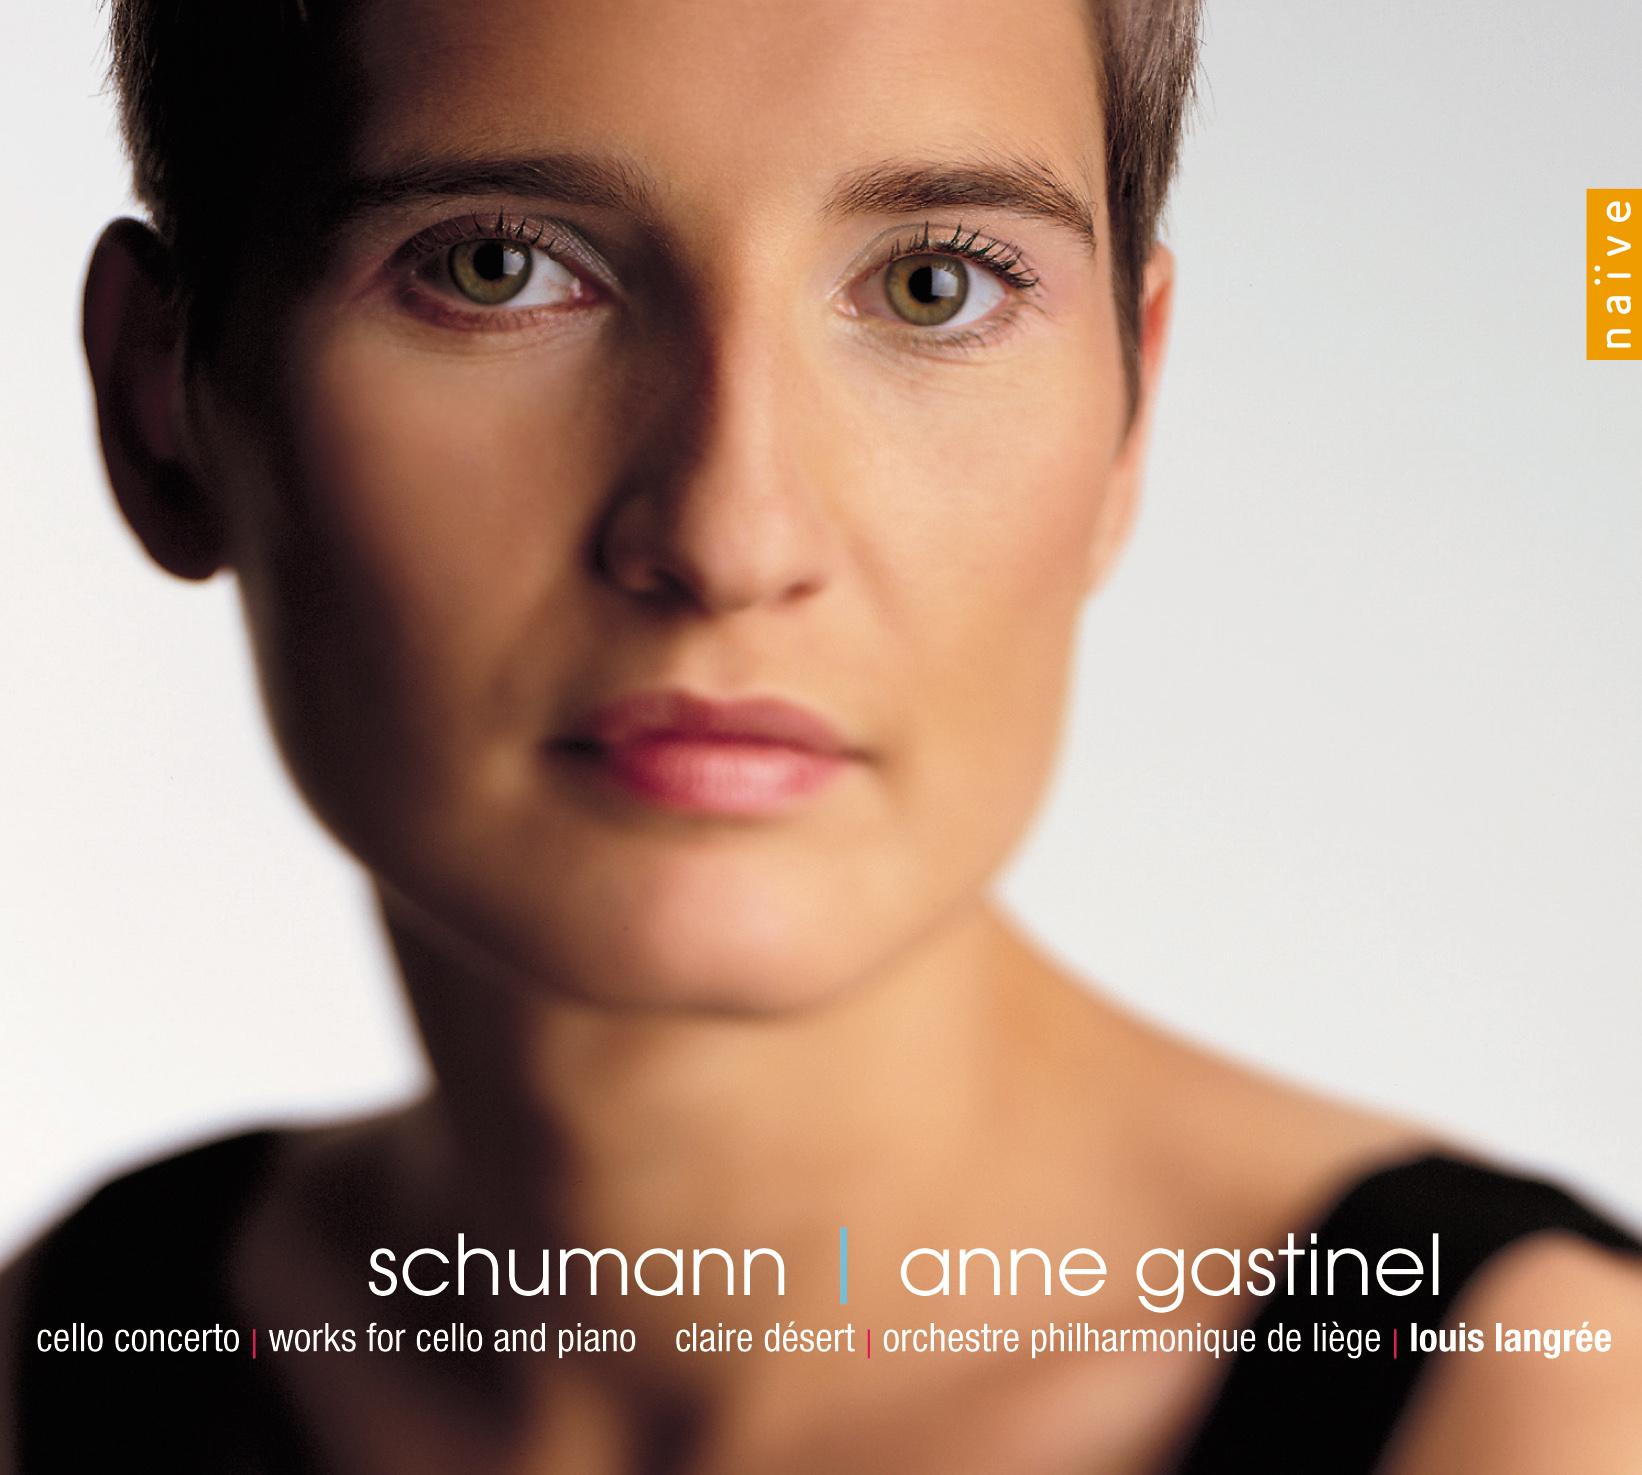 V4897_Schumann_Gastinel.jpg